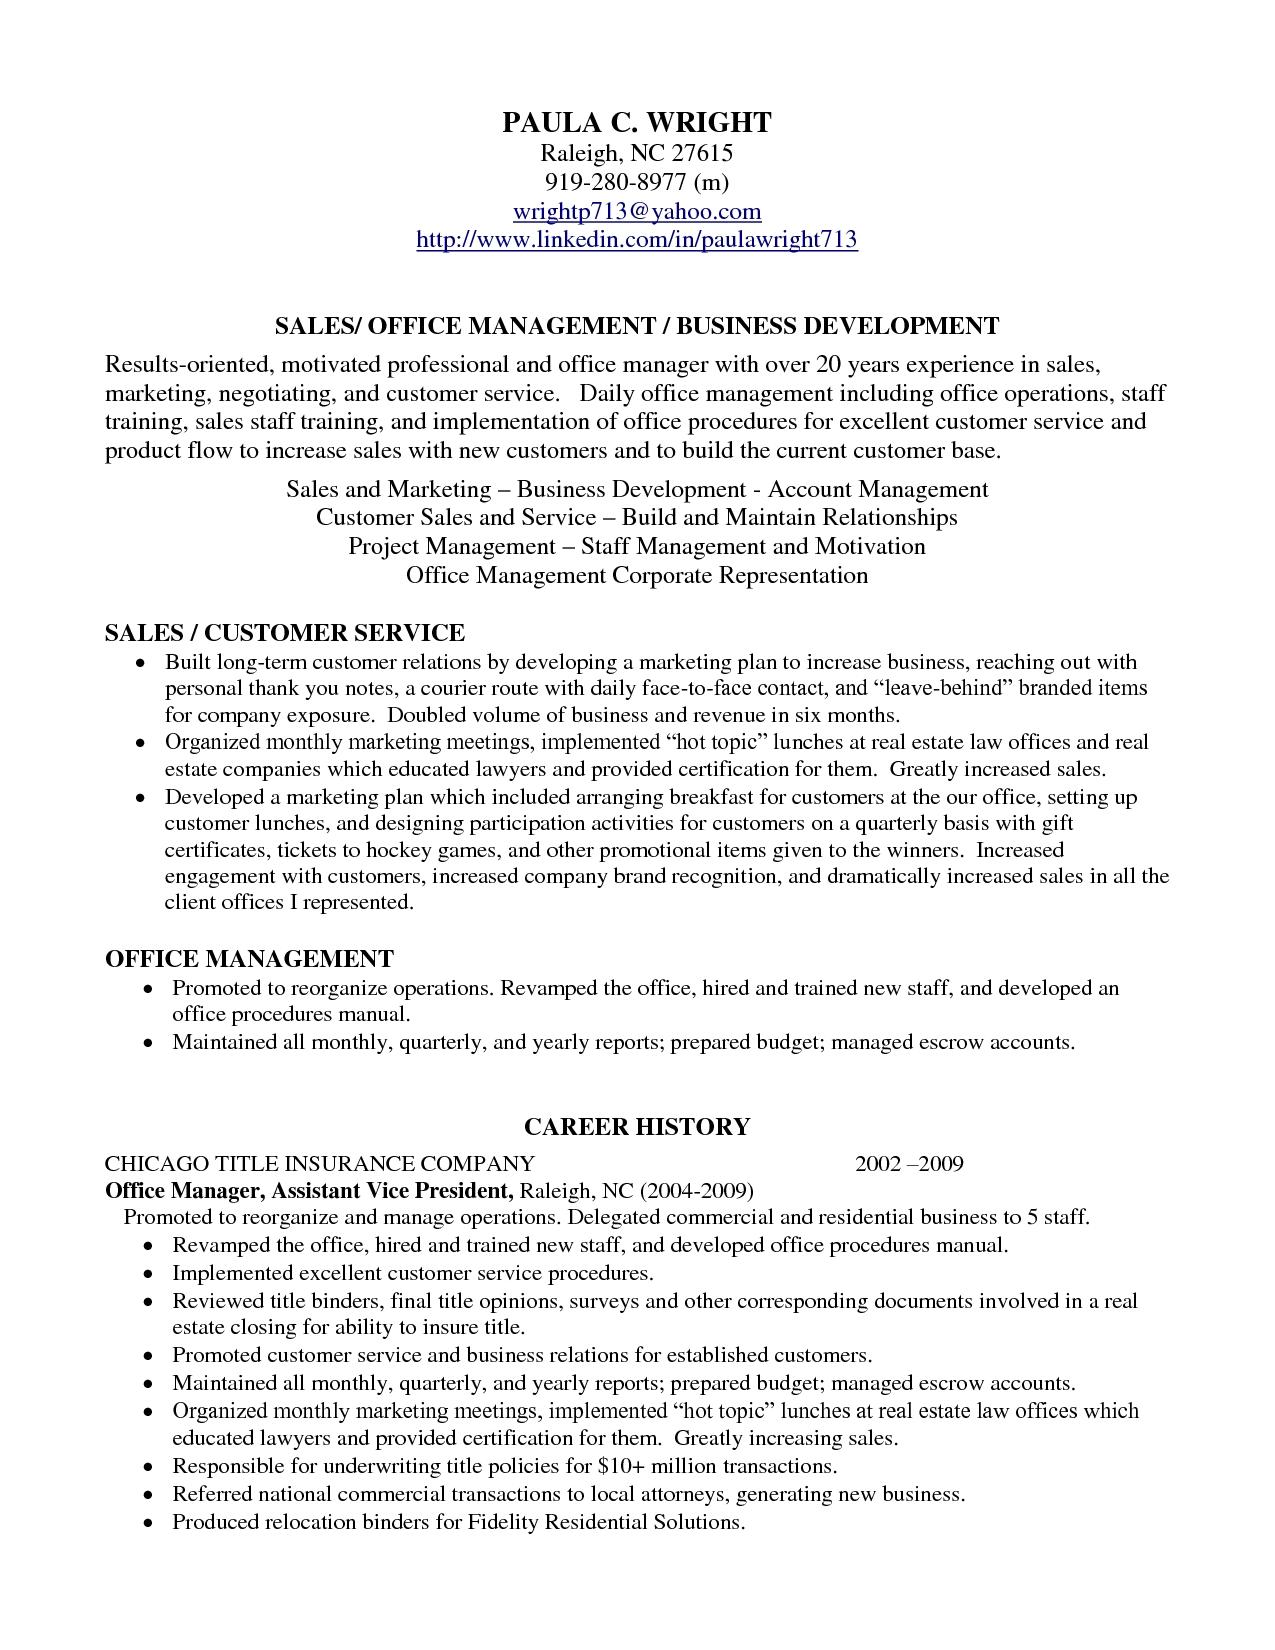 resumerofile examplesrofessional marketing sample manager home